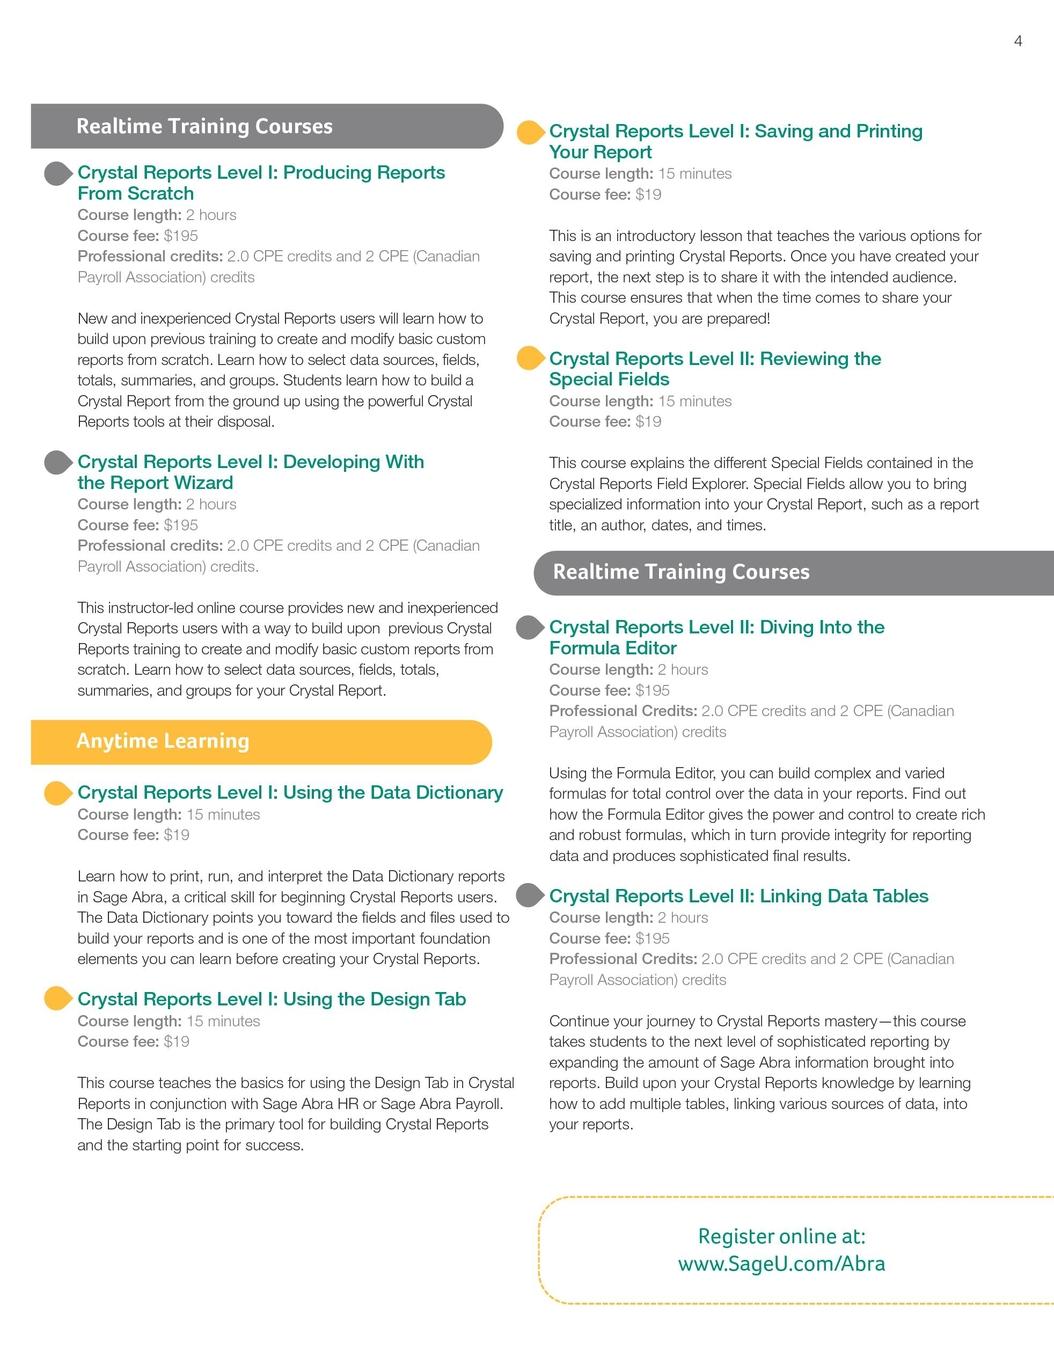 Sage Abra HRMS - Customer Training Catalog - Summer 2011